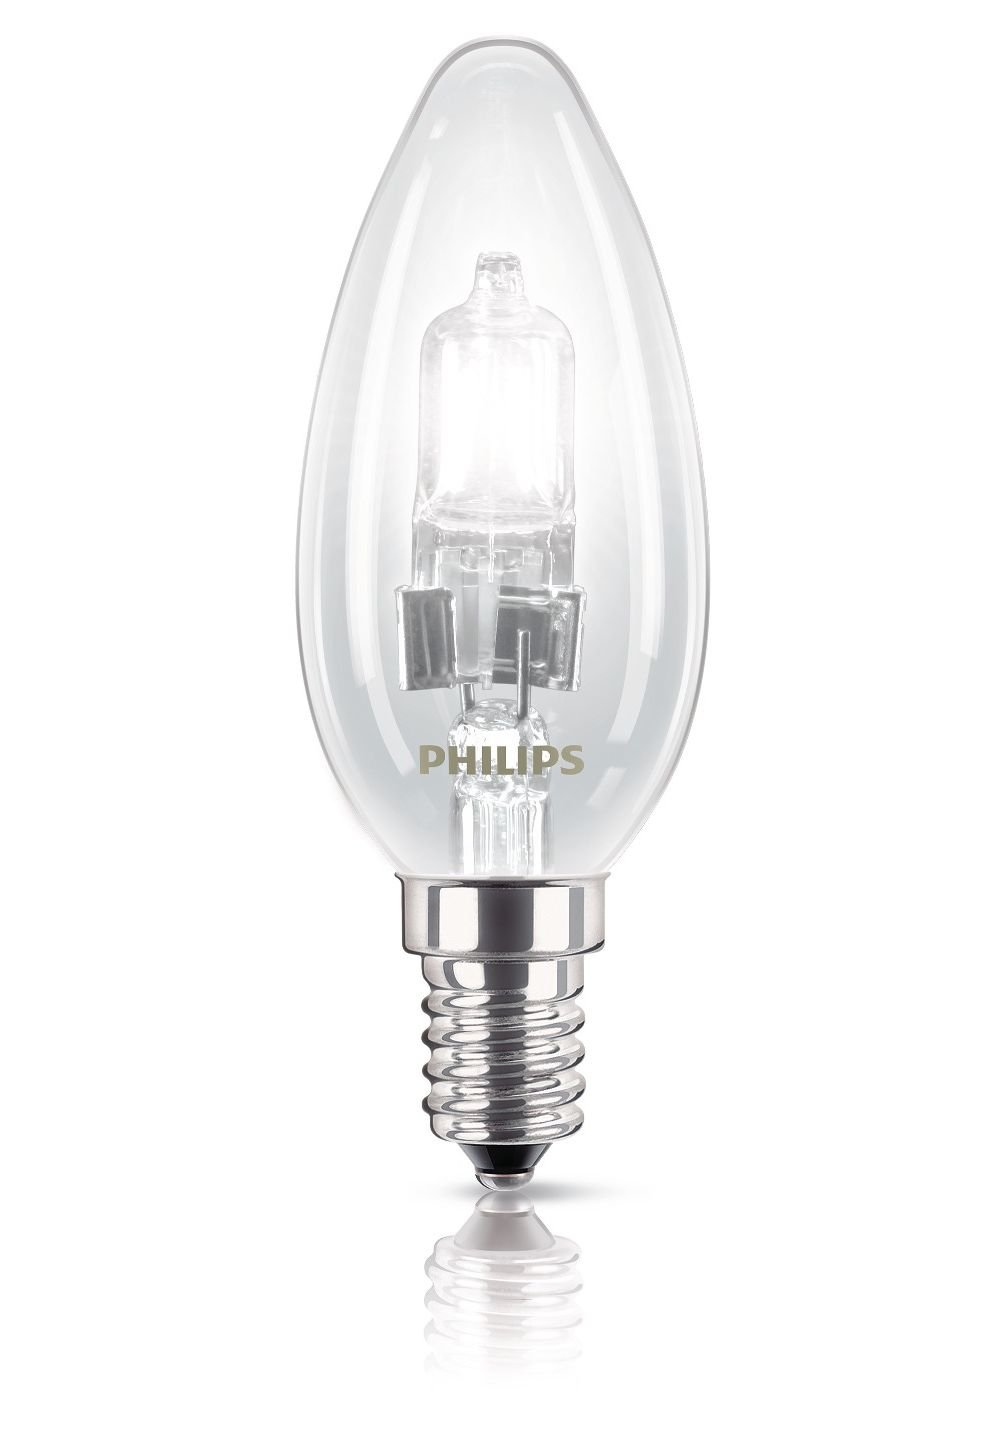 Philips Alogena Oliva 42W-55W E14